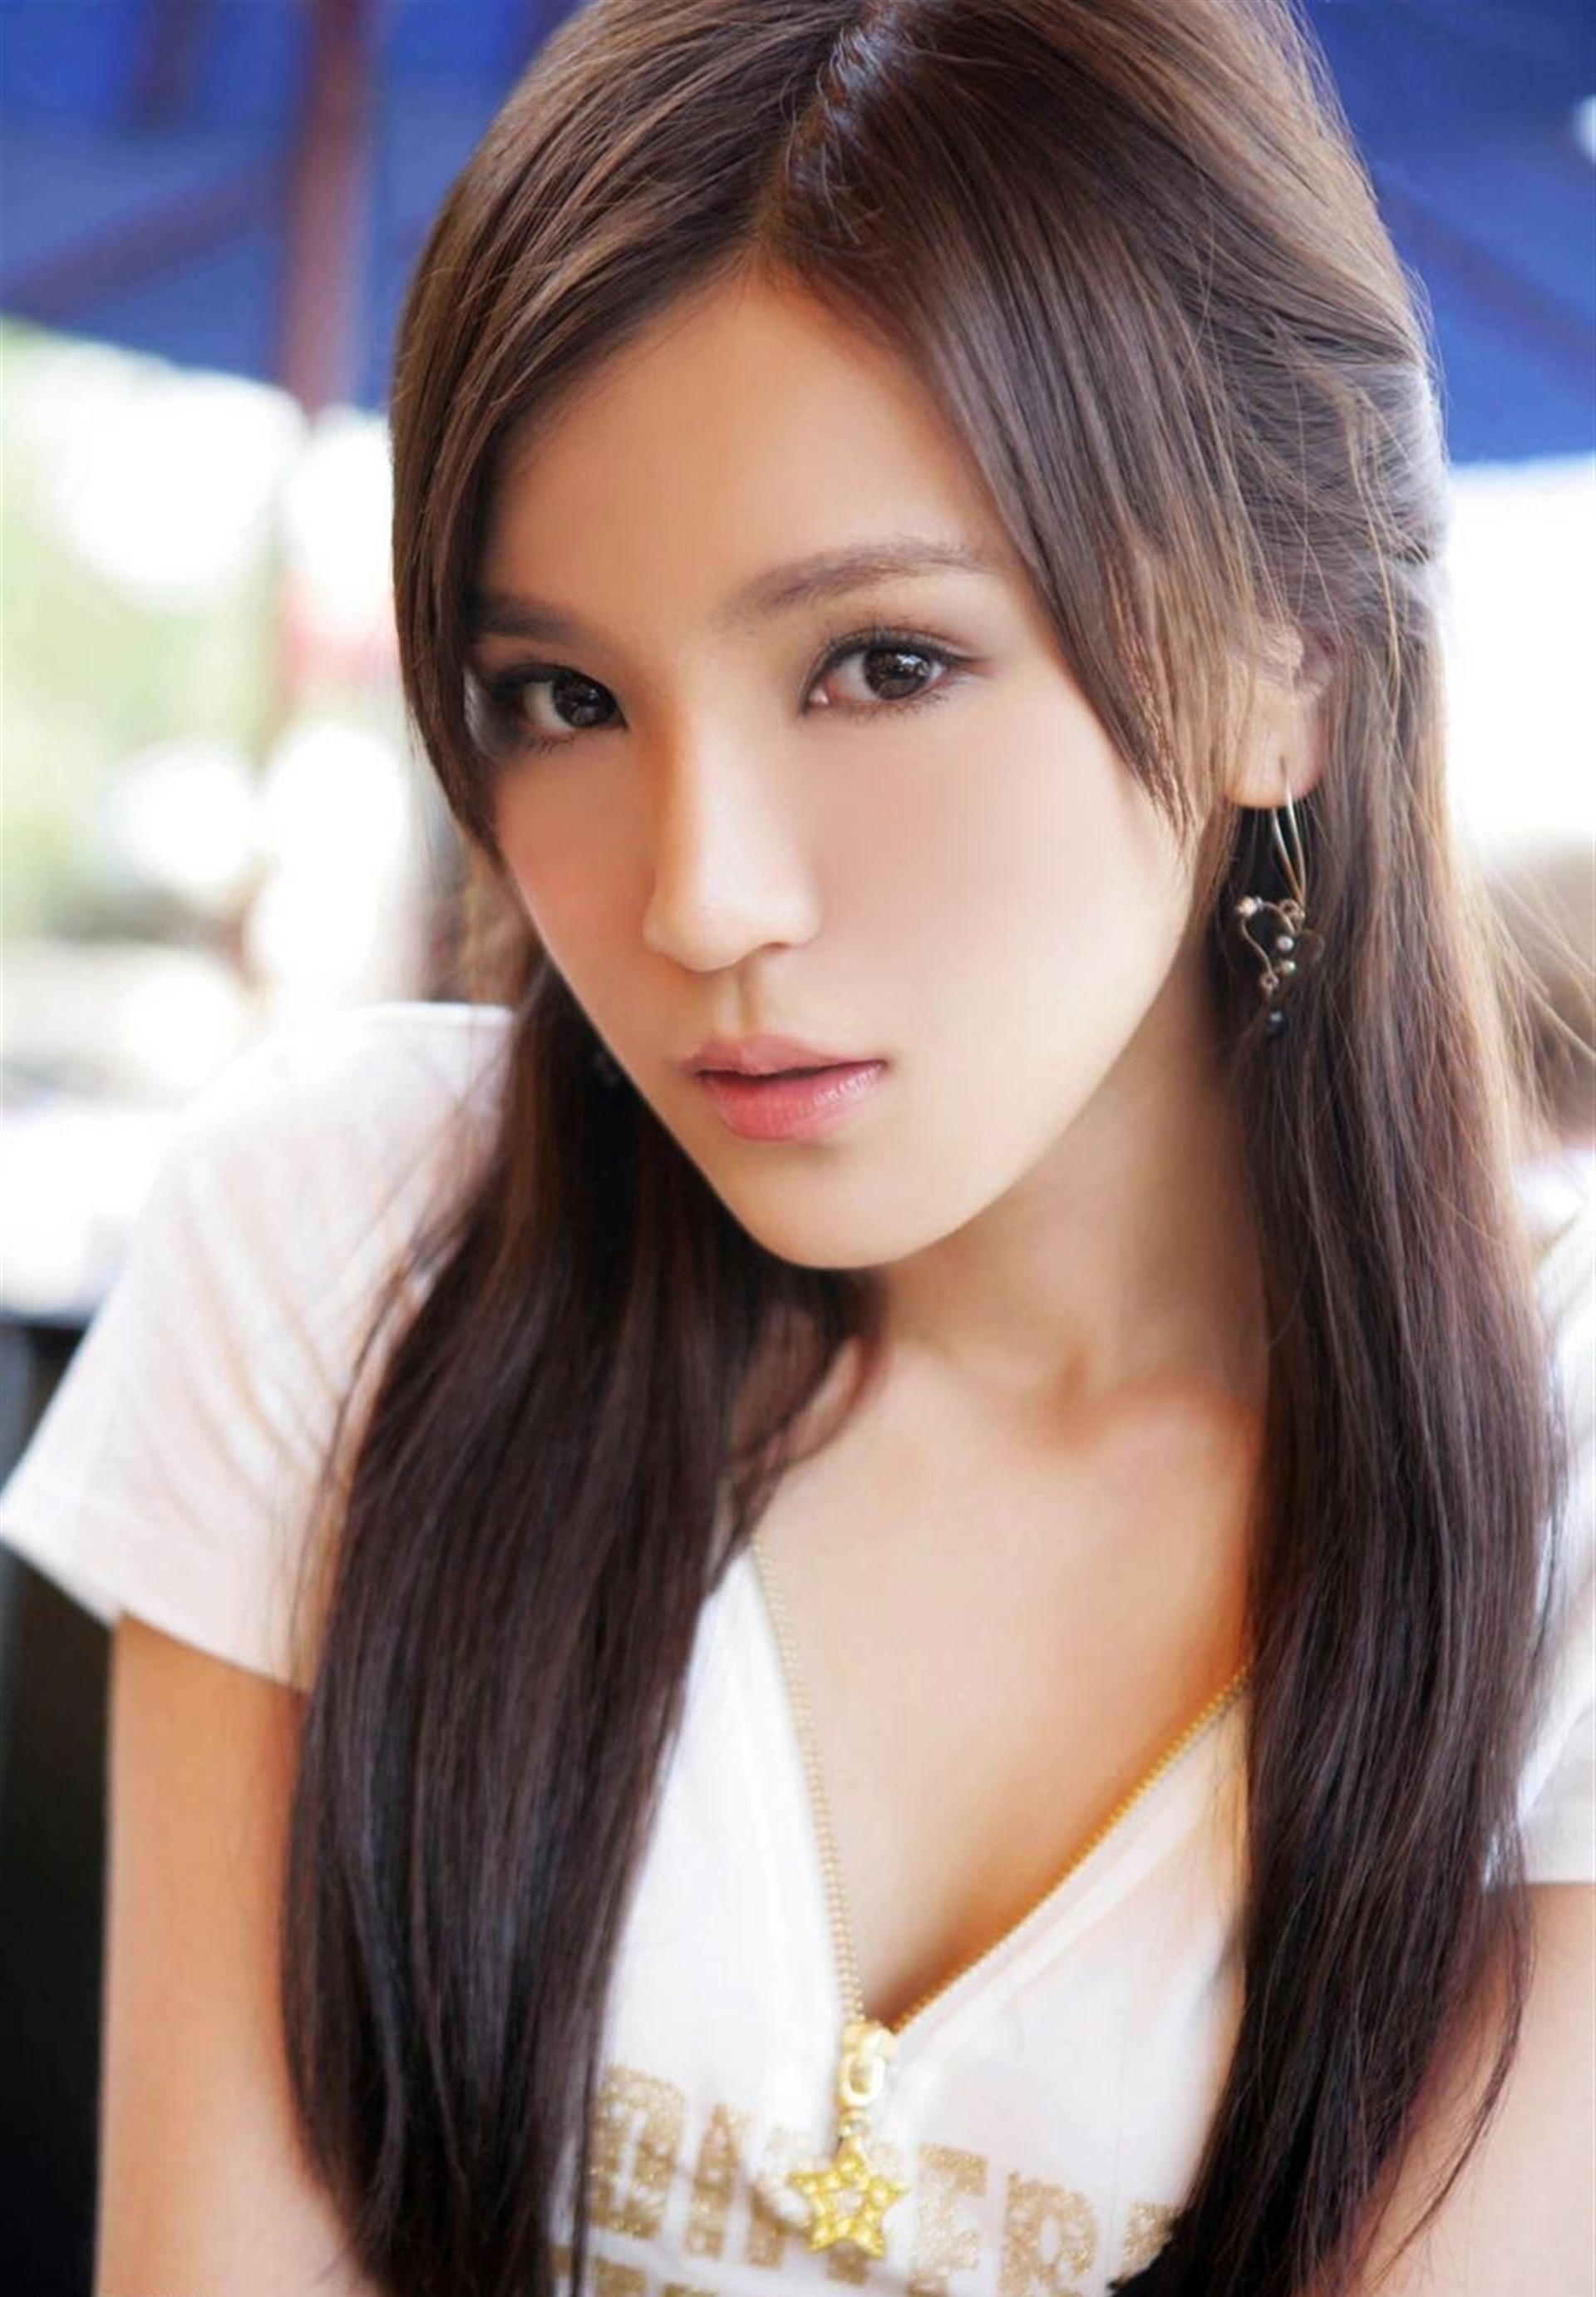 Asian Girls Hairstyles Girls Hairstyles Pinterest